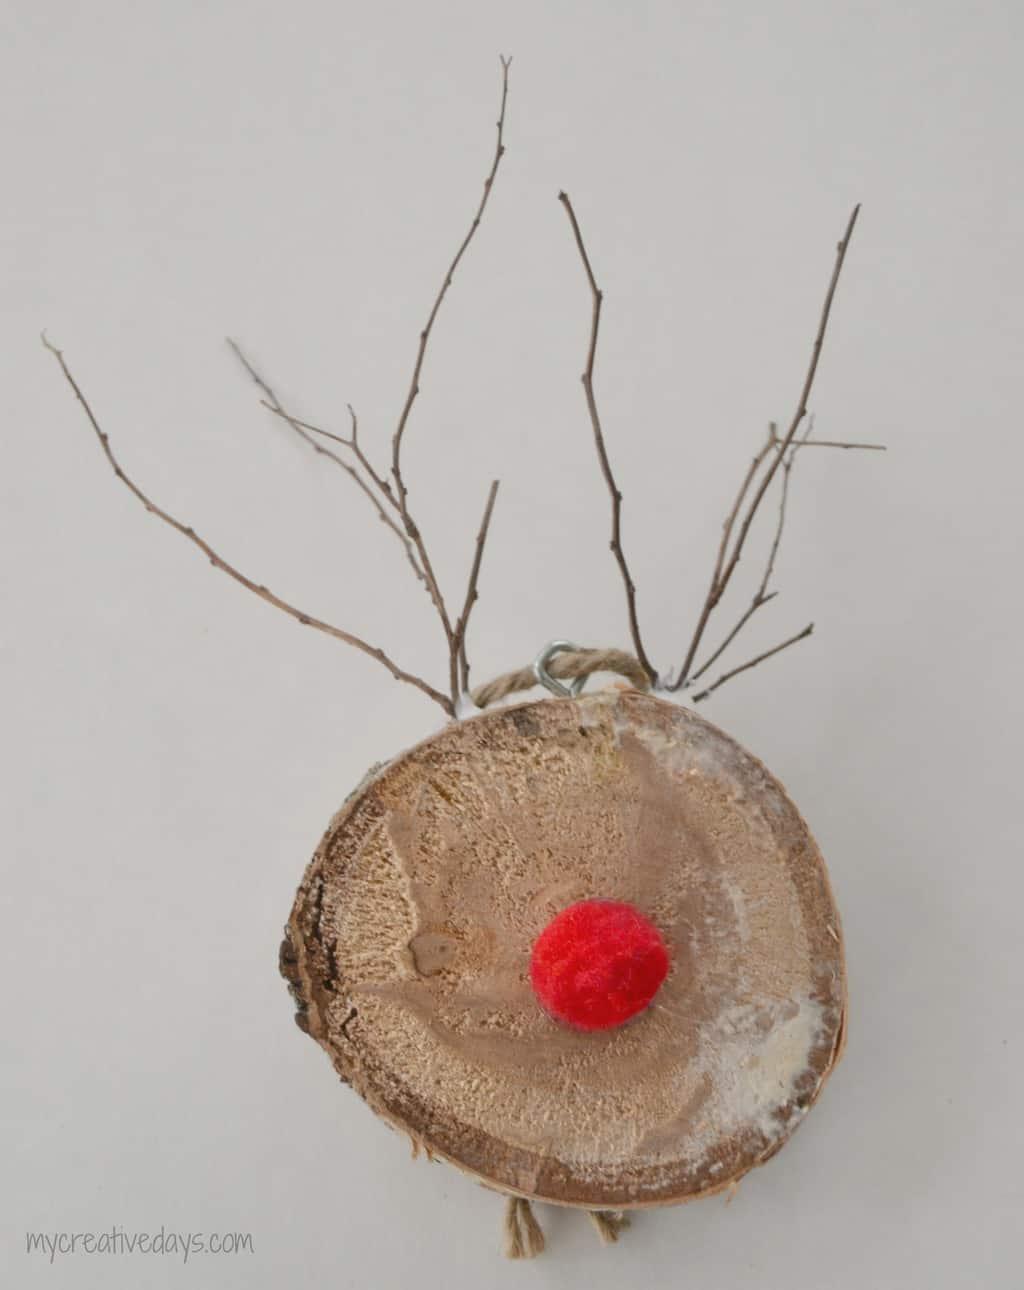 Birch Reindeer Ornaments mycreativedays.com